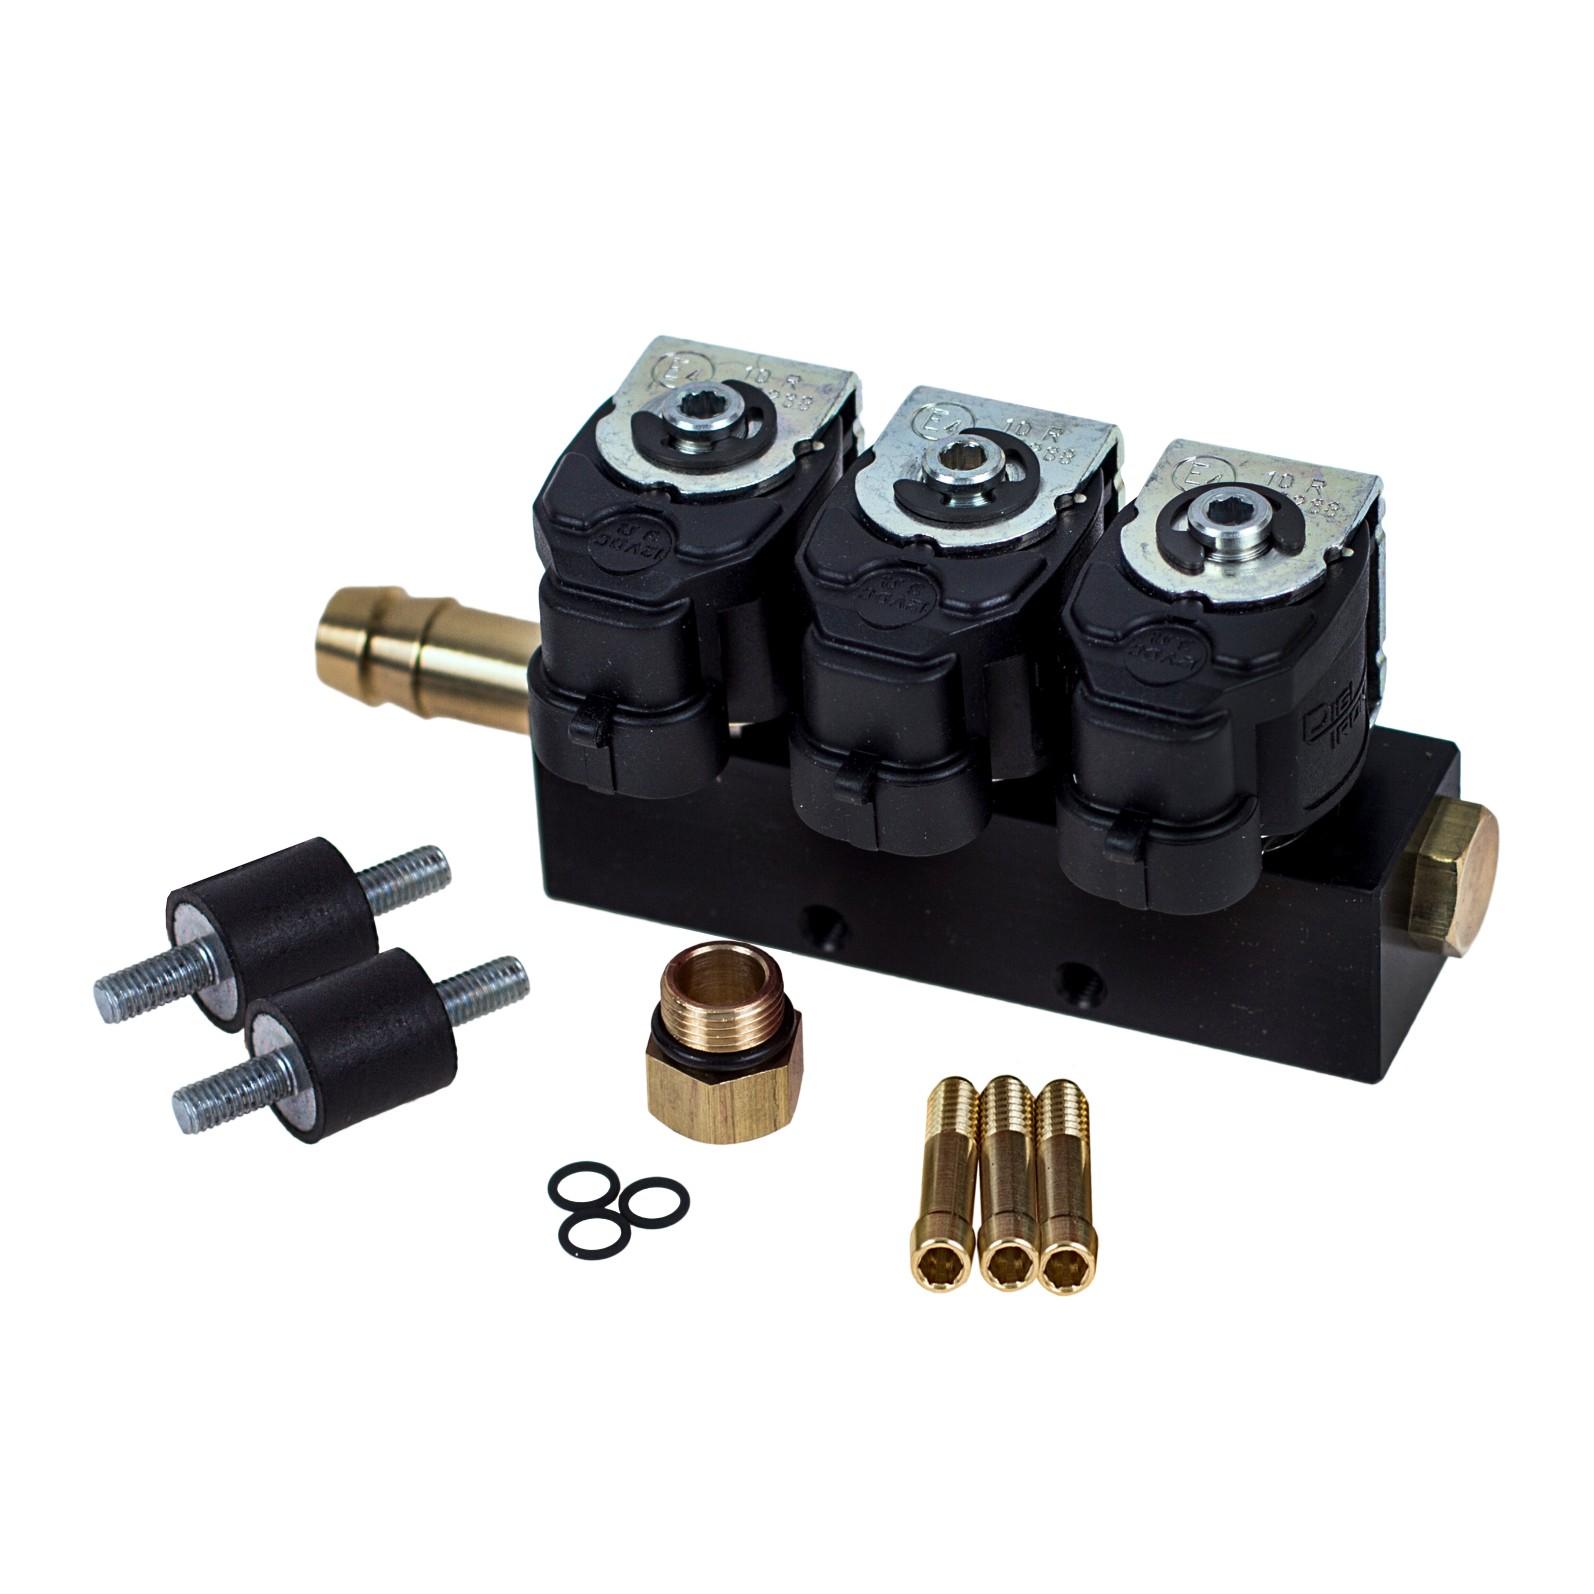 Injector Digitronic Valtek Rail Type 30 BFC 3CYL